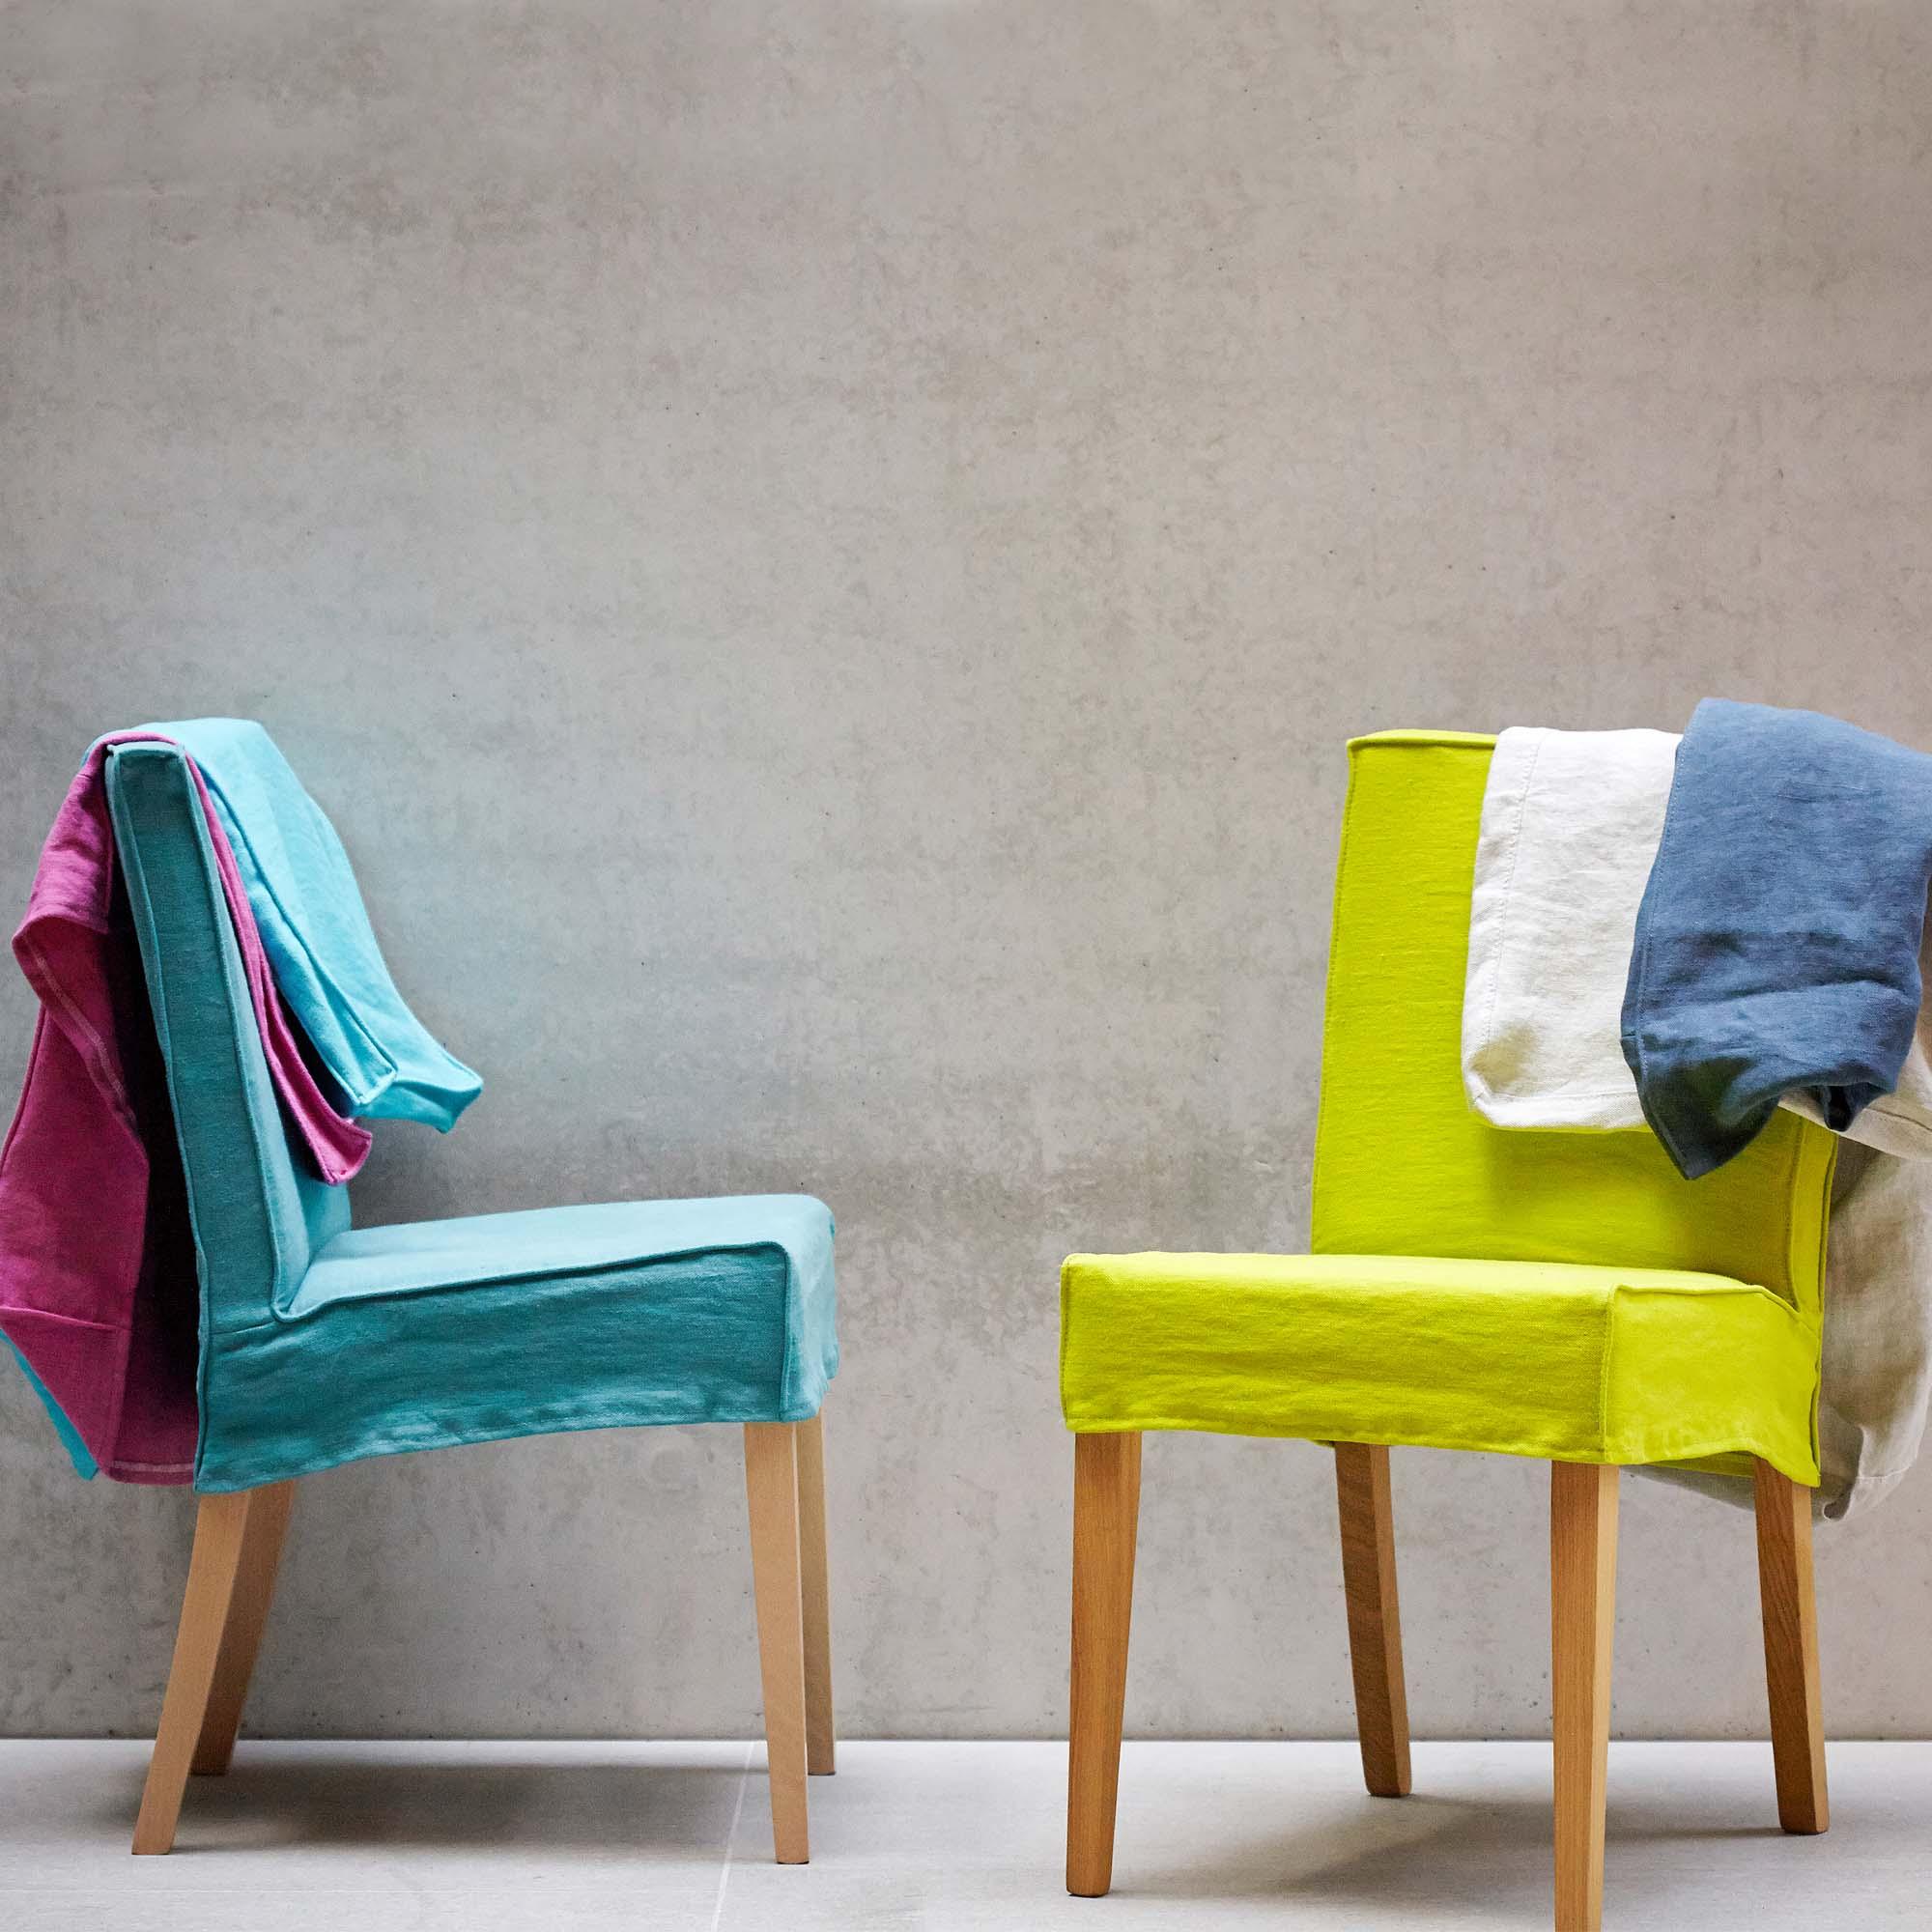 jan kurtz hussenstuhl mino bei. Black Bedroom Furniture Sets. Home Design Ideas